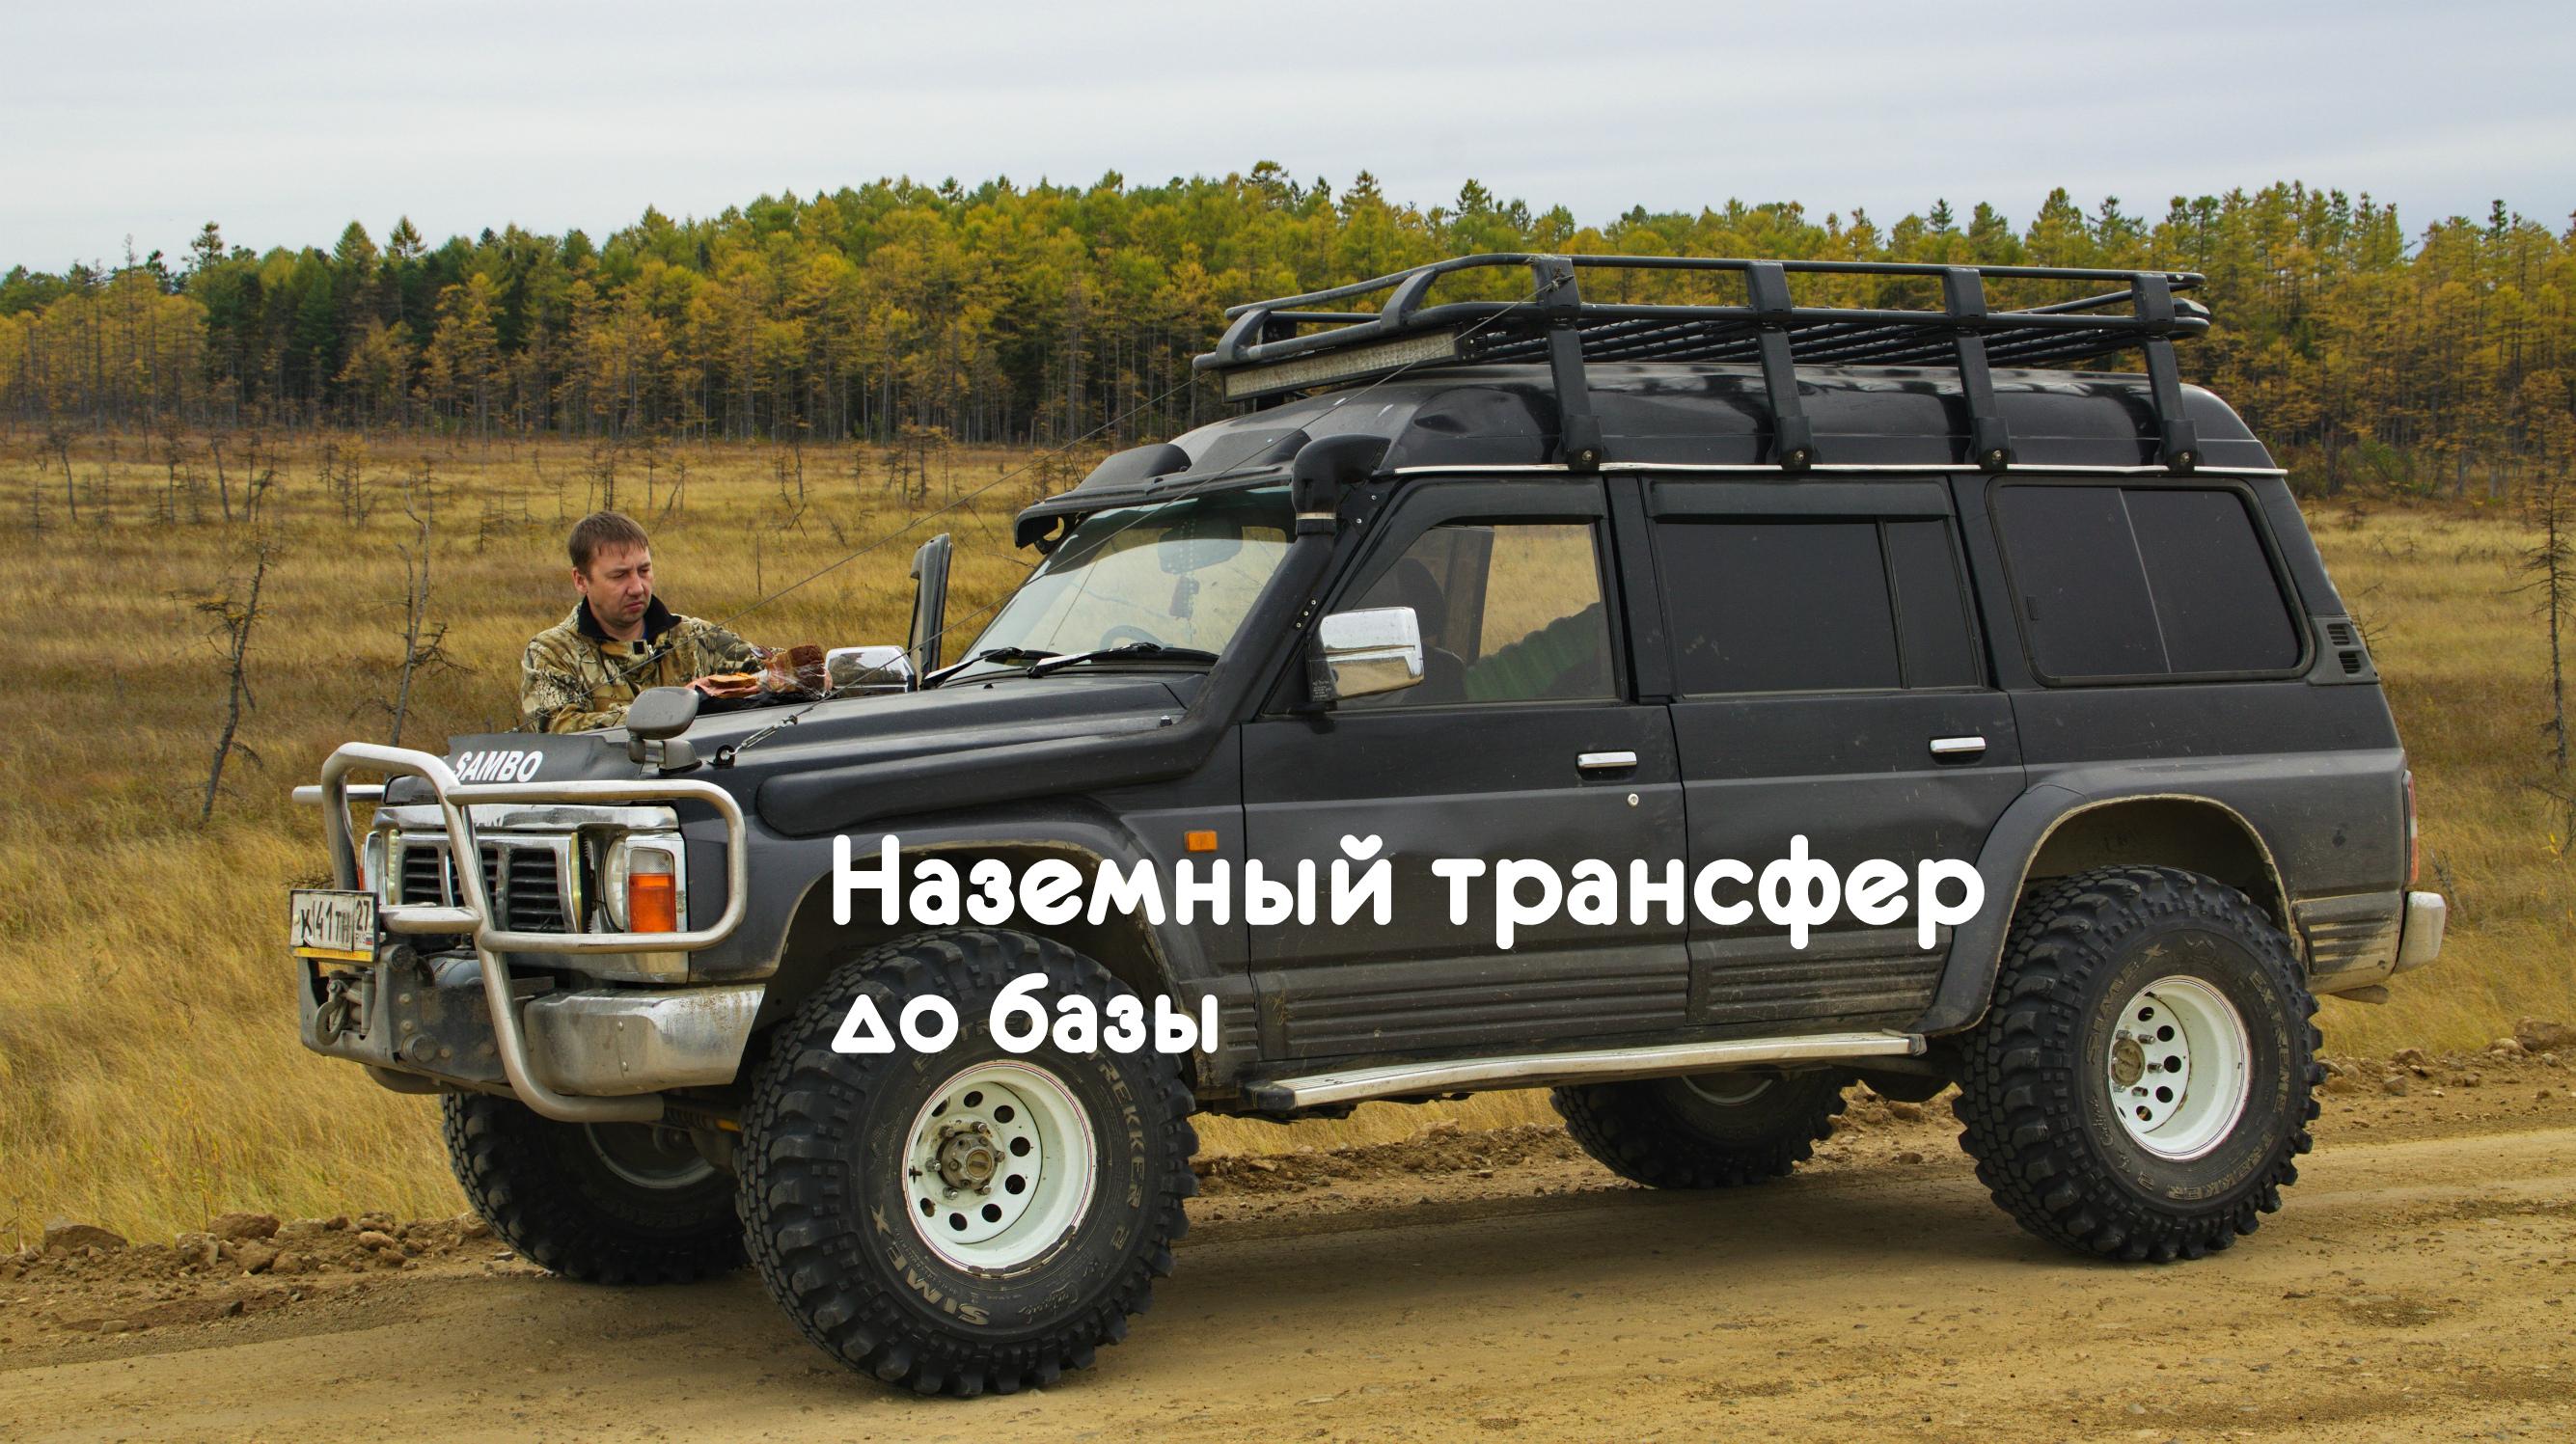 сафарь-2